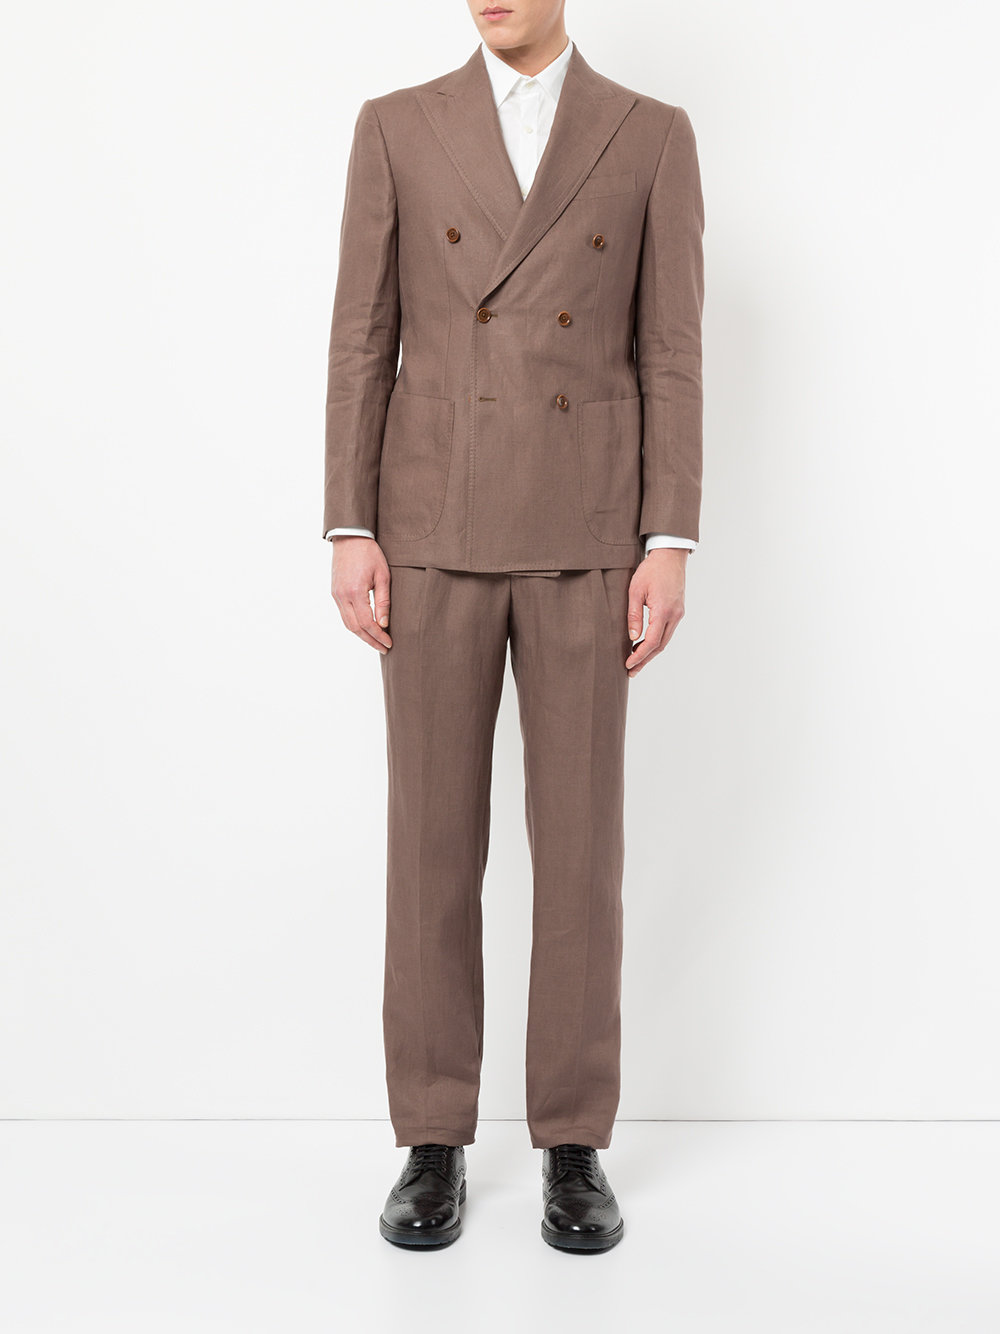 SPOTTED: Zayn Malik Wearing Dior Homme